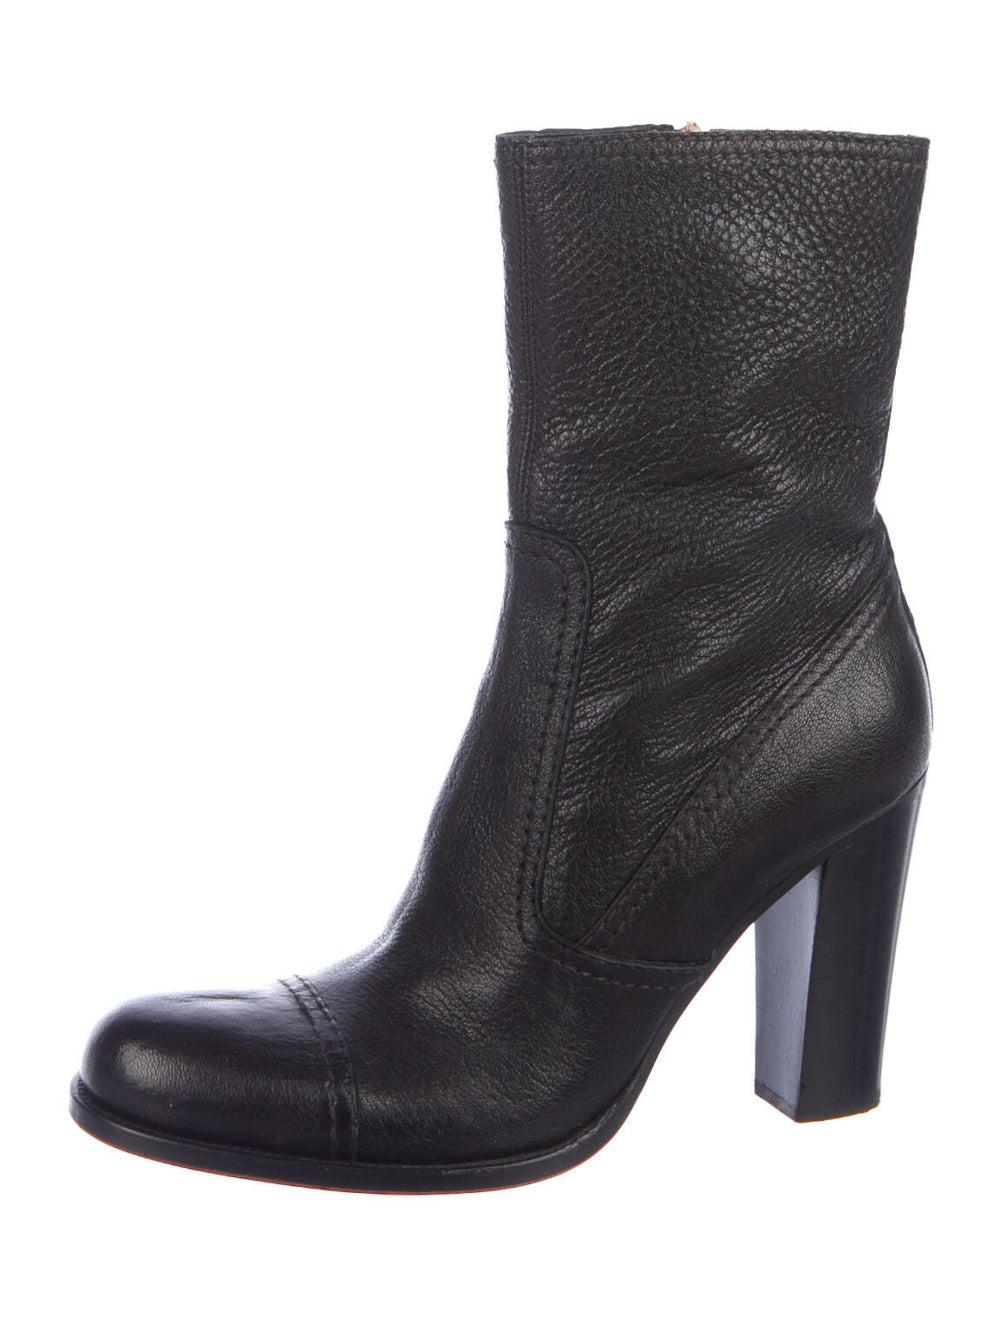 Prada Leather Boots Black - image 2